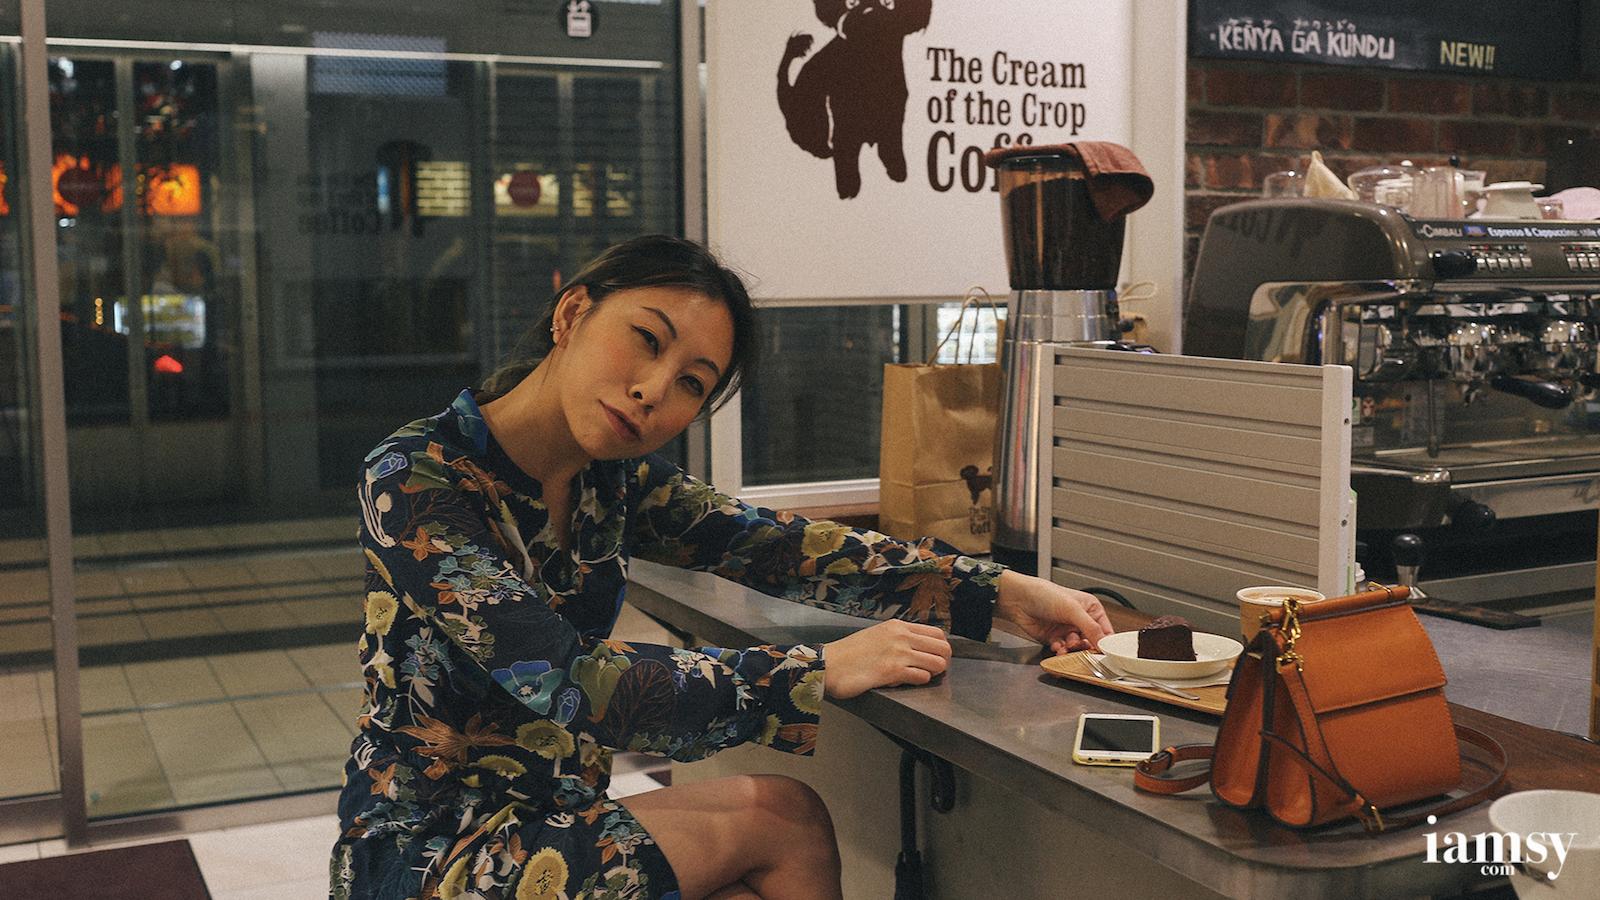 2016-iamsy-mar-tokyo-the-cream-of-the-crop-coffee-06